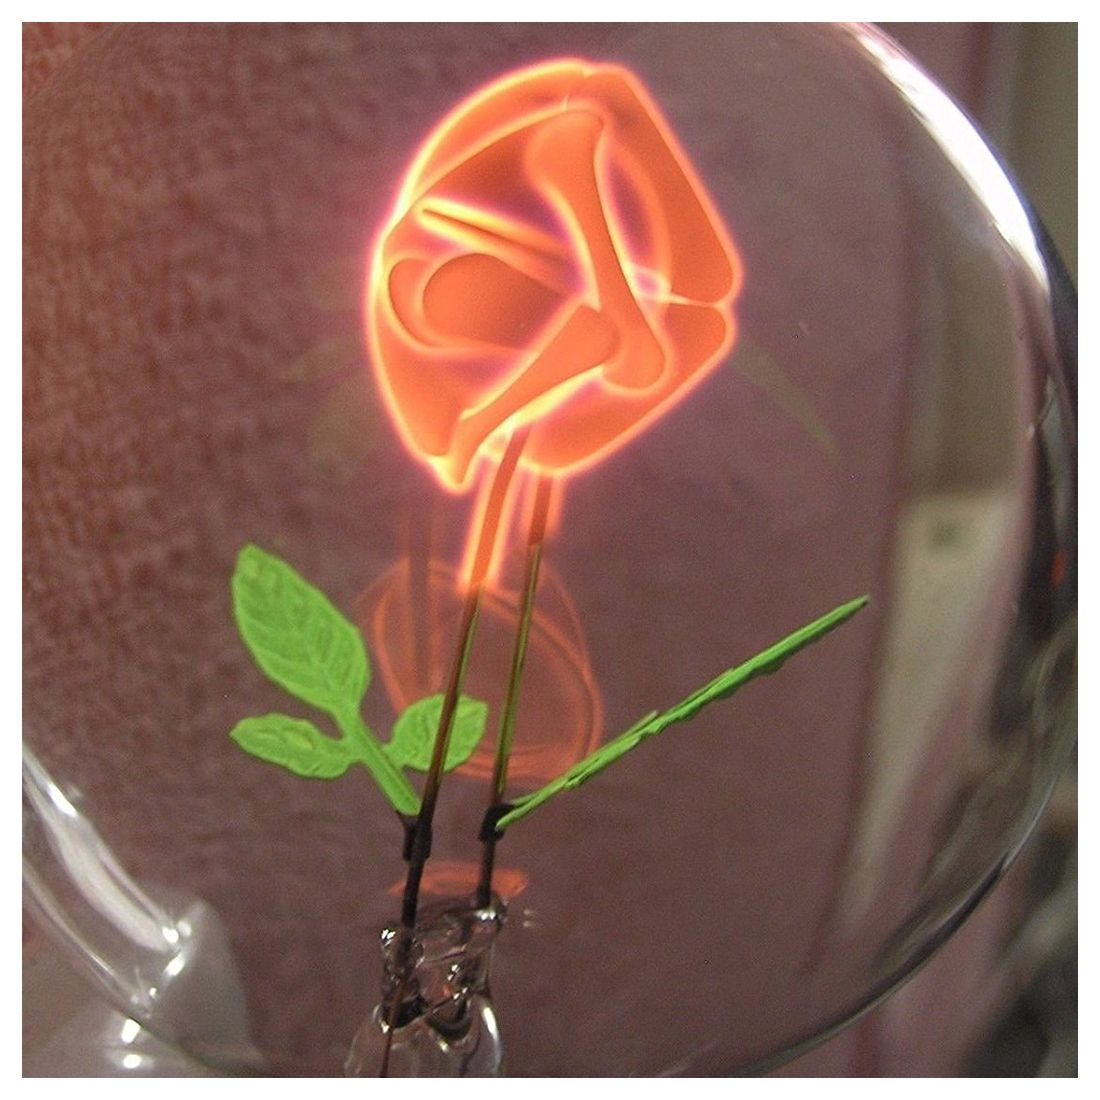 artful neon light bulb E26/E27 110/220V nixie filament lamp tube rose wild at heart neon sign advertise custom logo neon bulb beer glass tube handcrafted neon glass tubes recreation room lamps 17x14